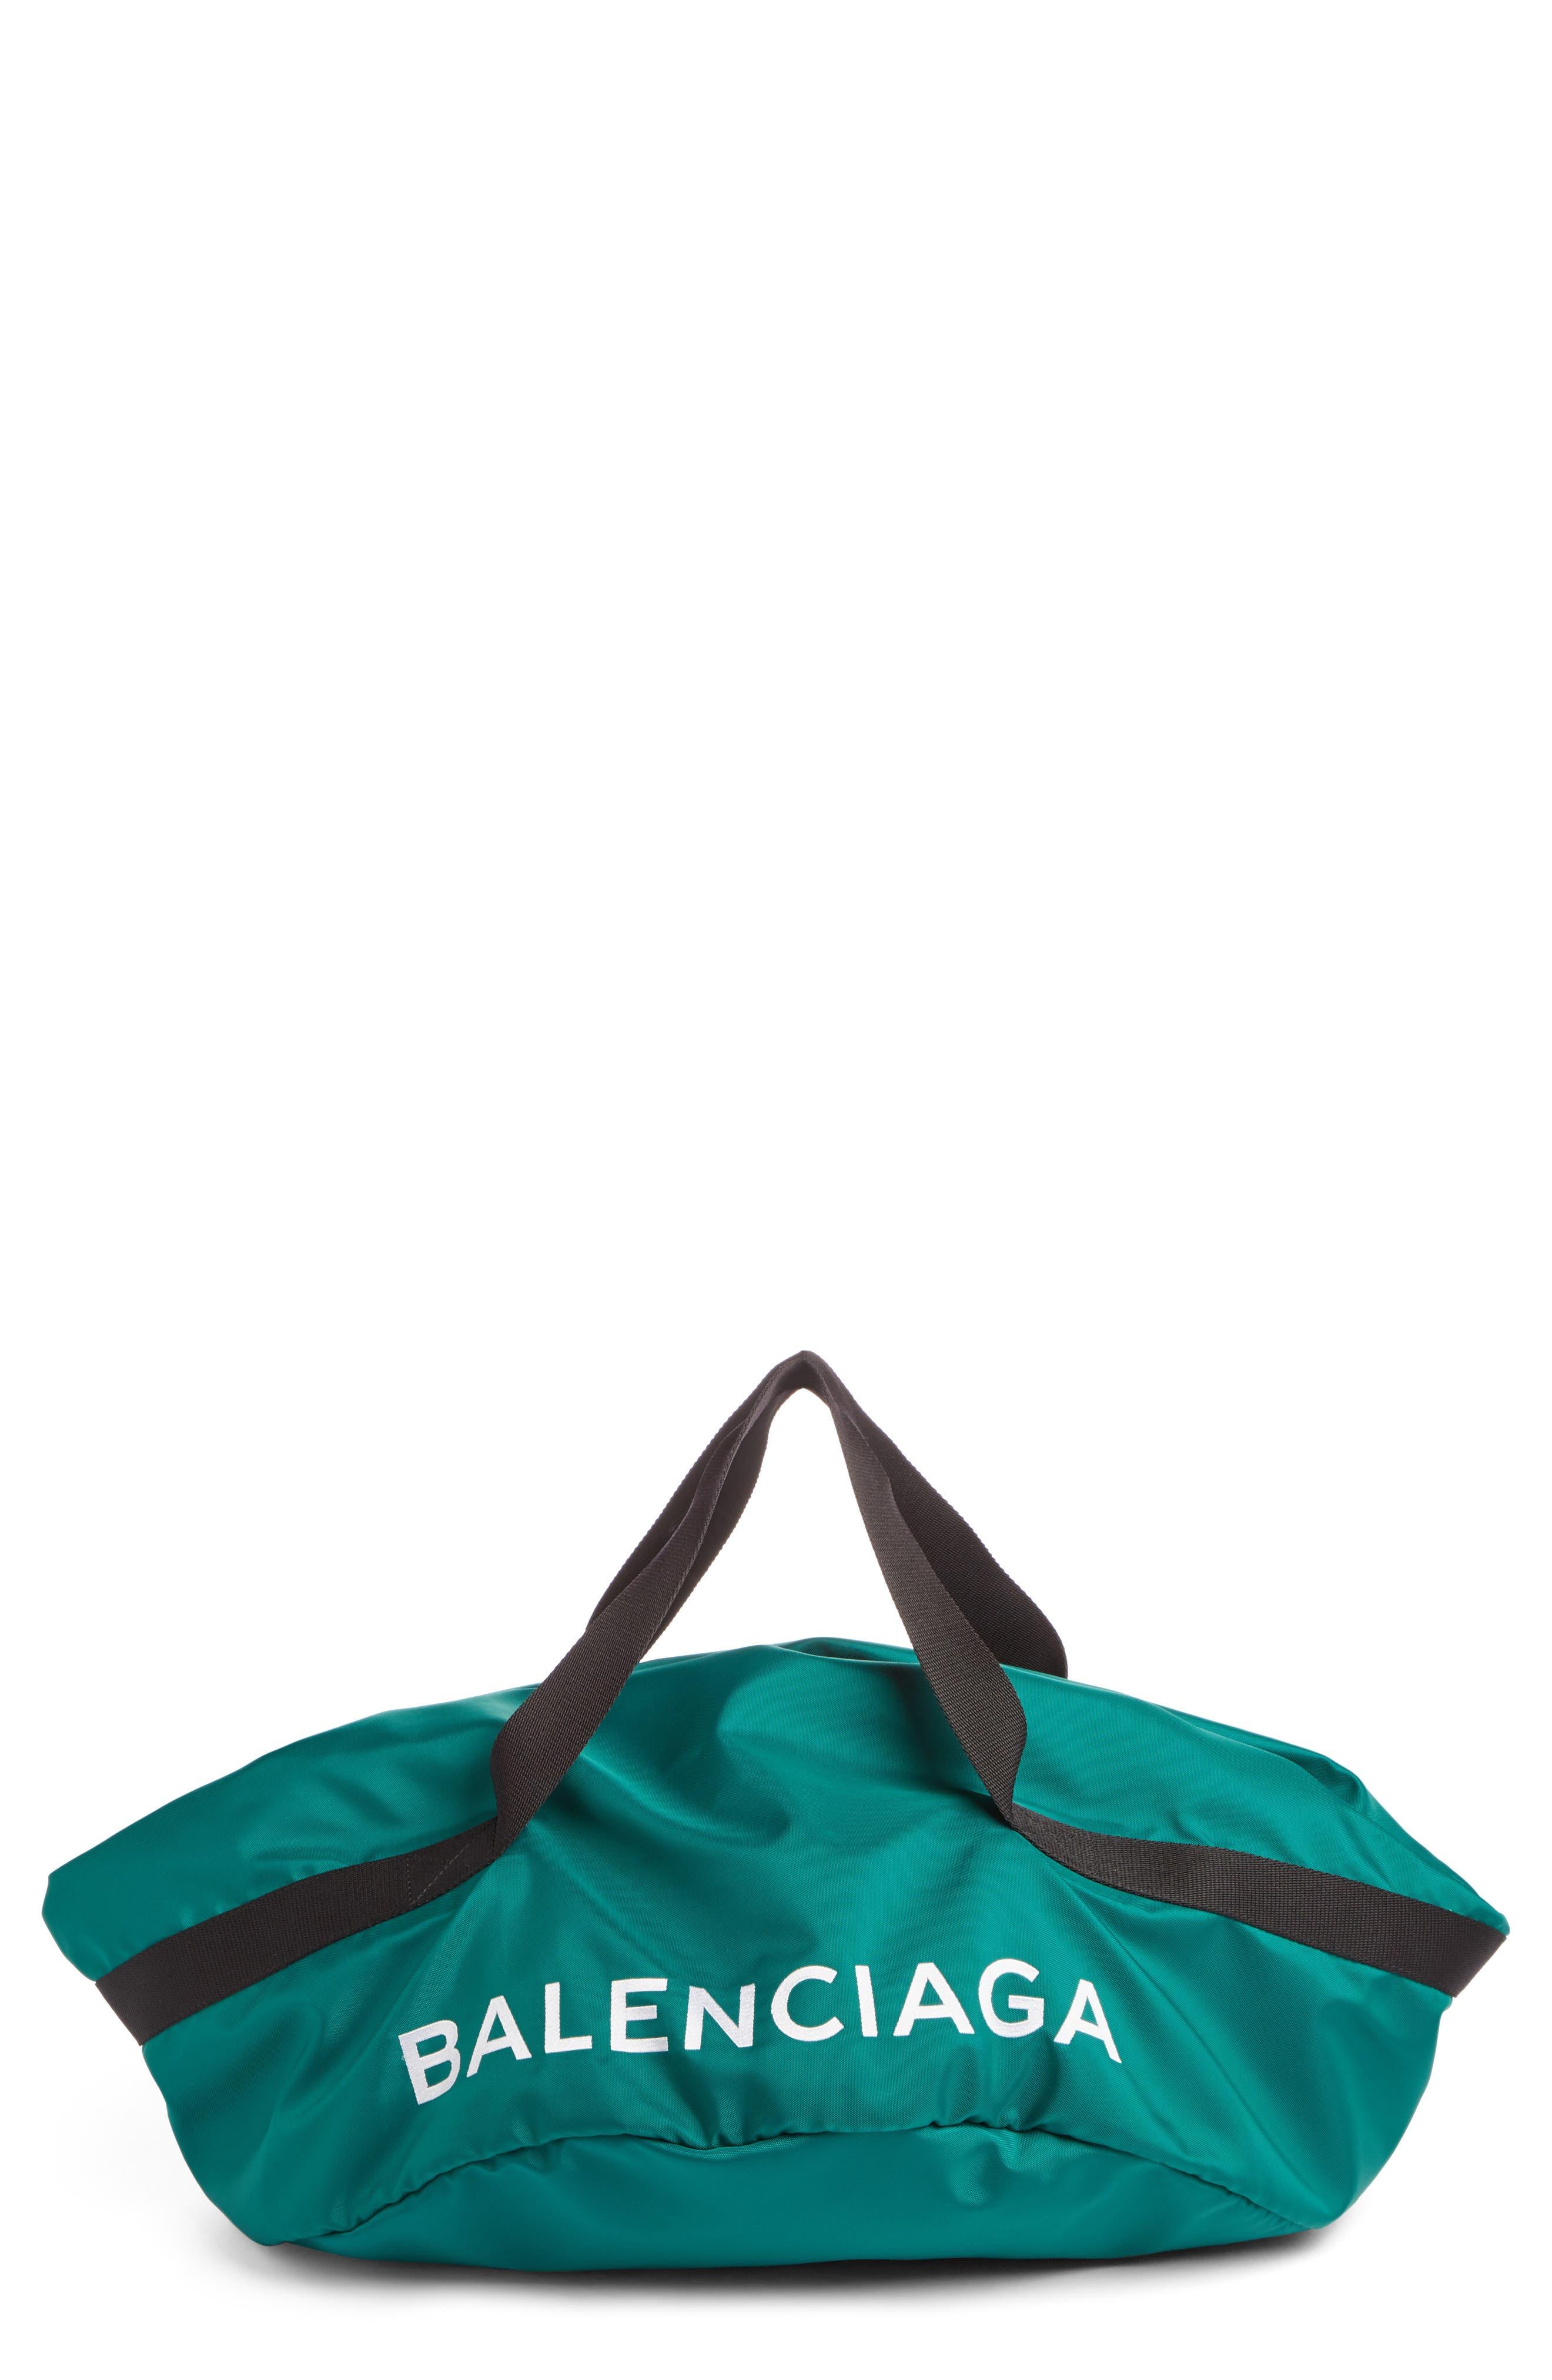 Small Wheel Bag,                             Main thumbnail 1, color,                             Vert Emeraude/ Noir